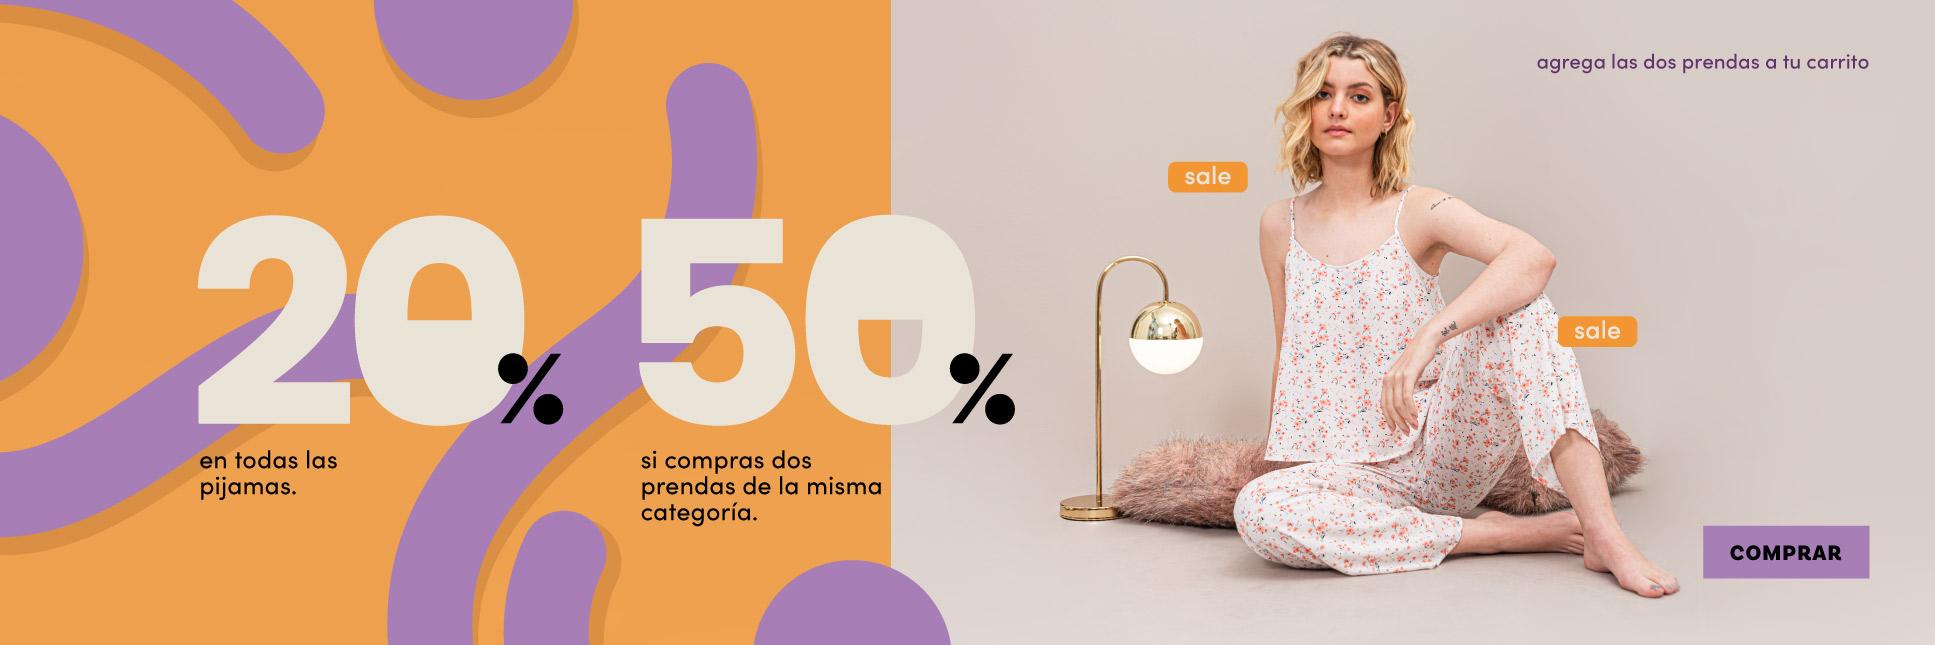 20% pijamas - 50% segunda prenda